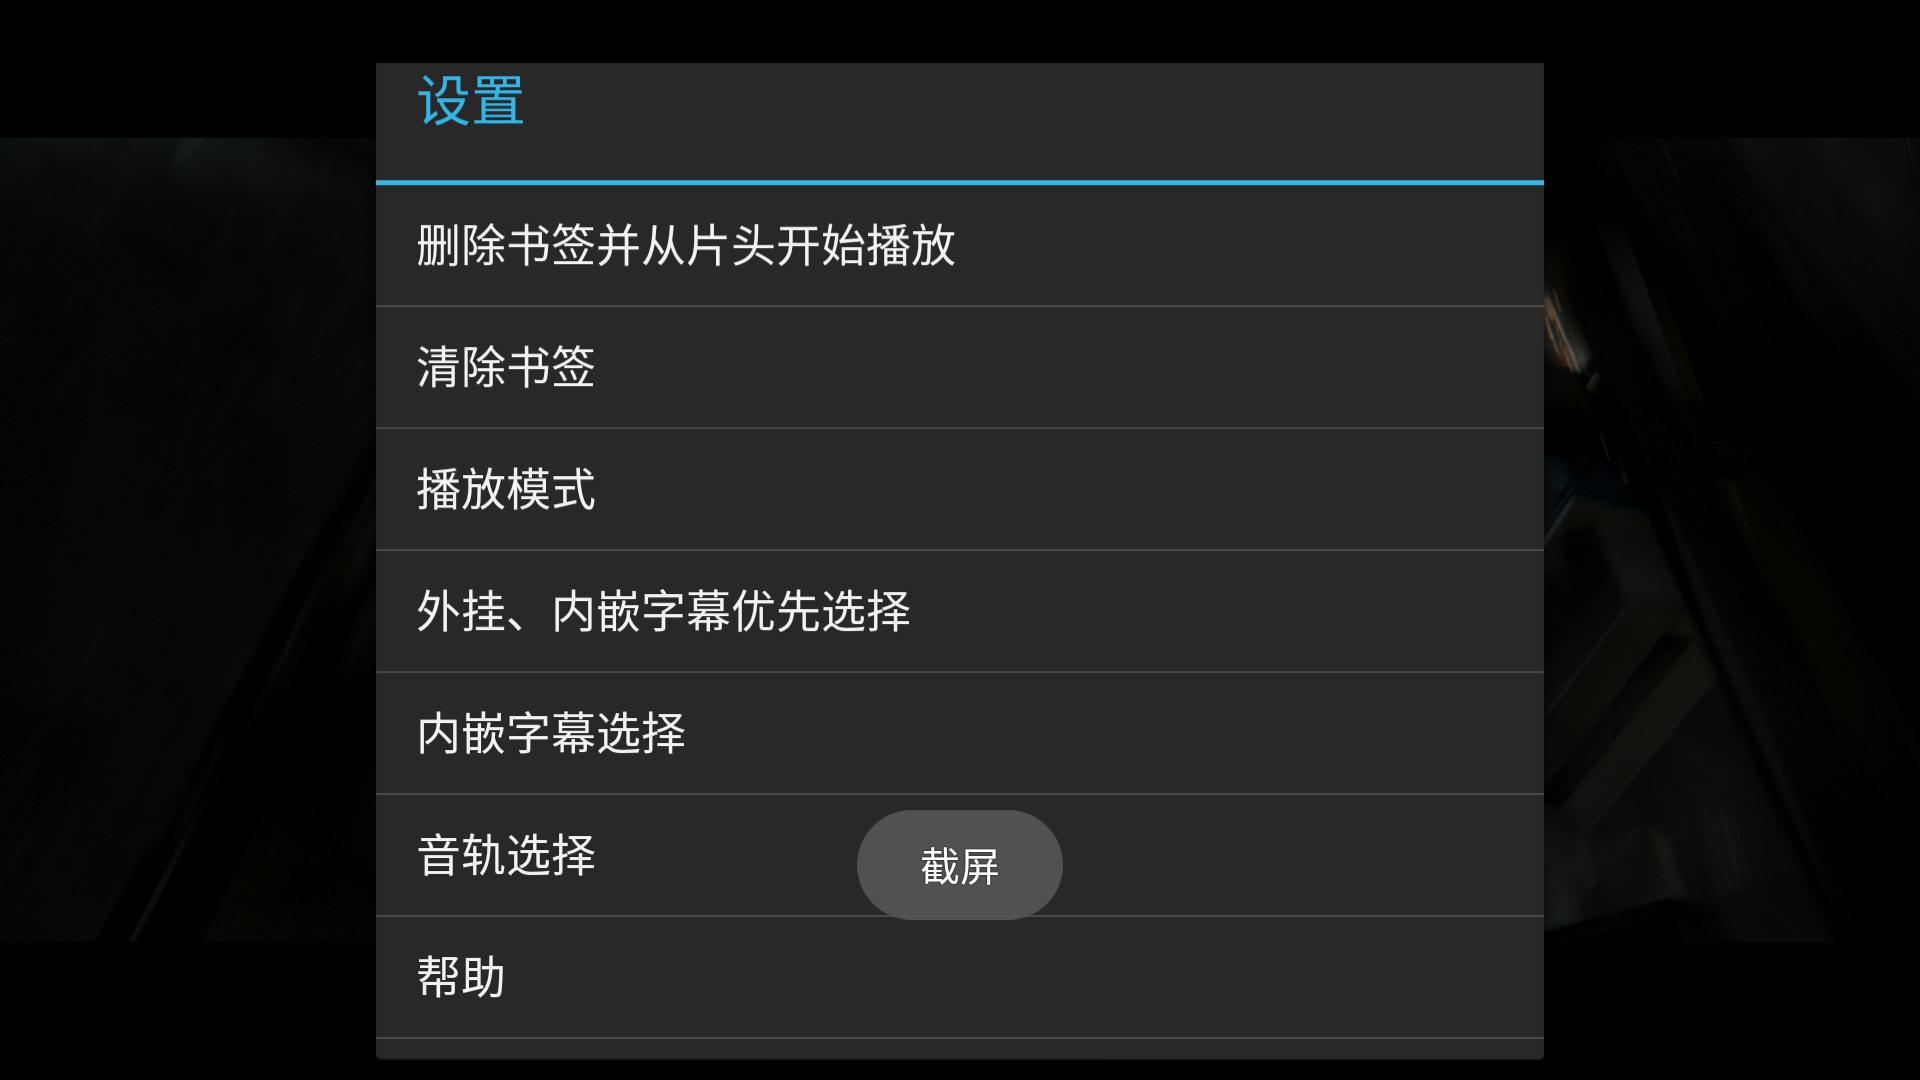 Screenshot_2018-06-01-16-07-04.png